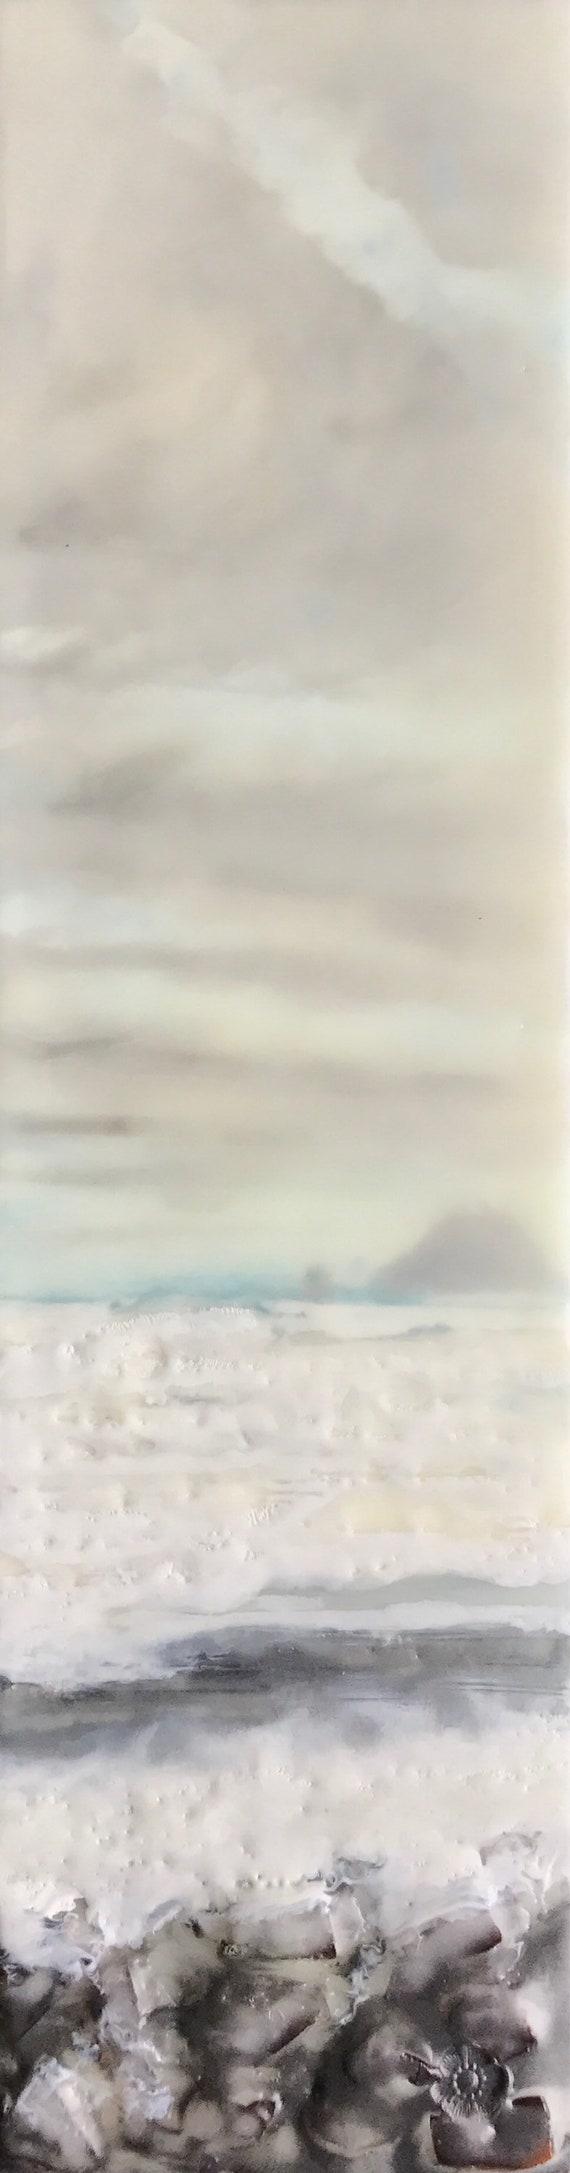 https://www.etsy.com/listing/594798642/sitting-on-the-rocks-coast-125x35